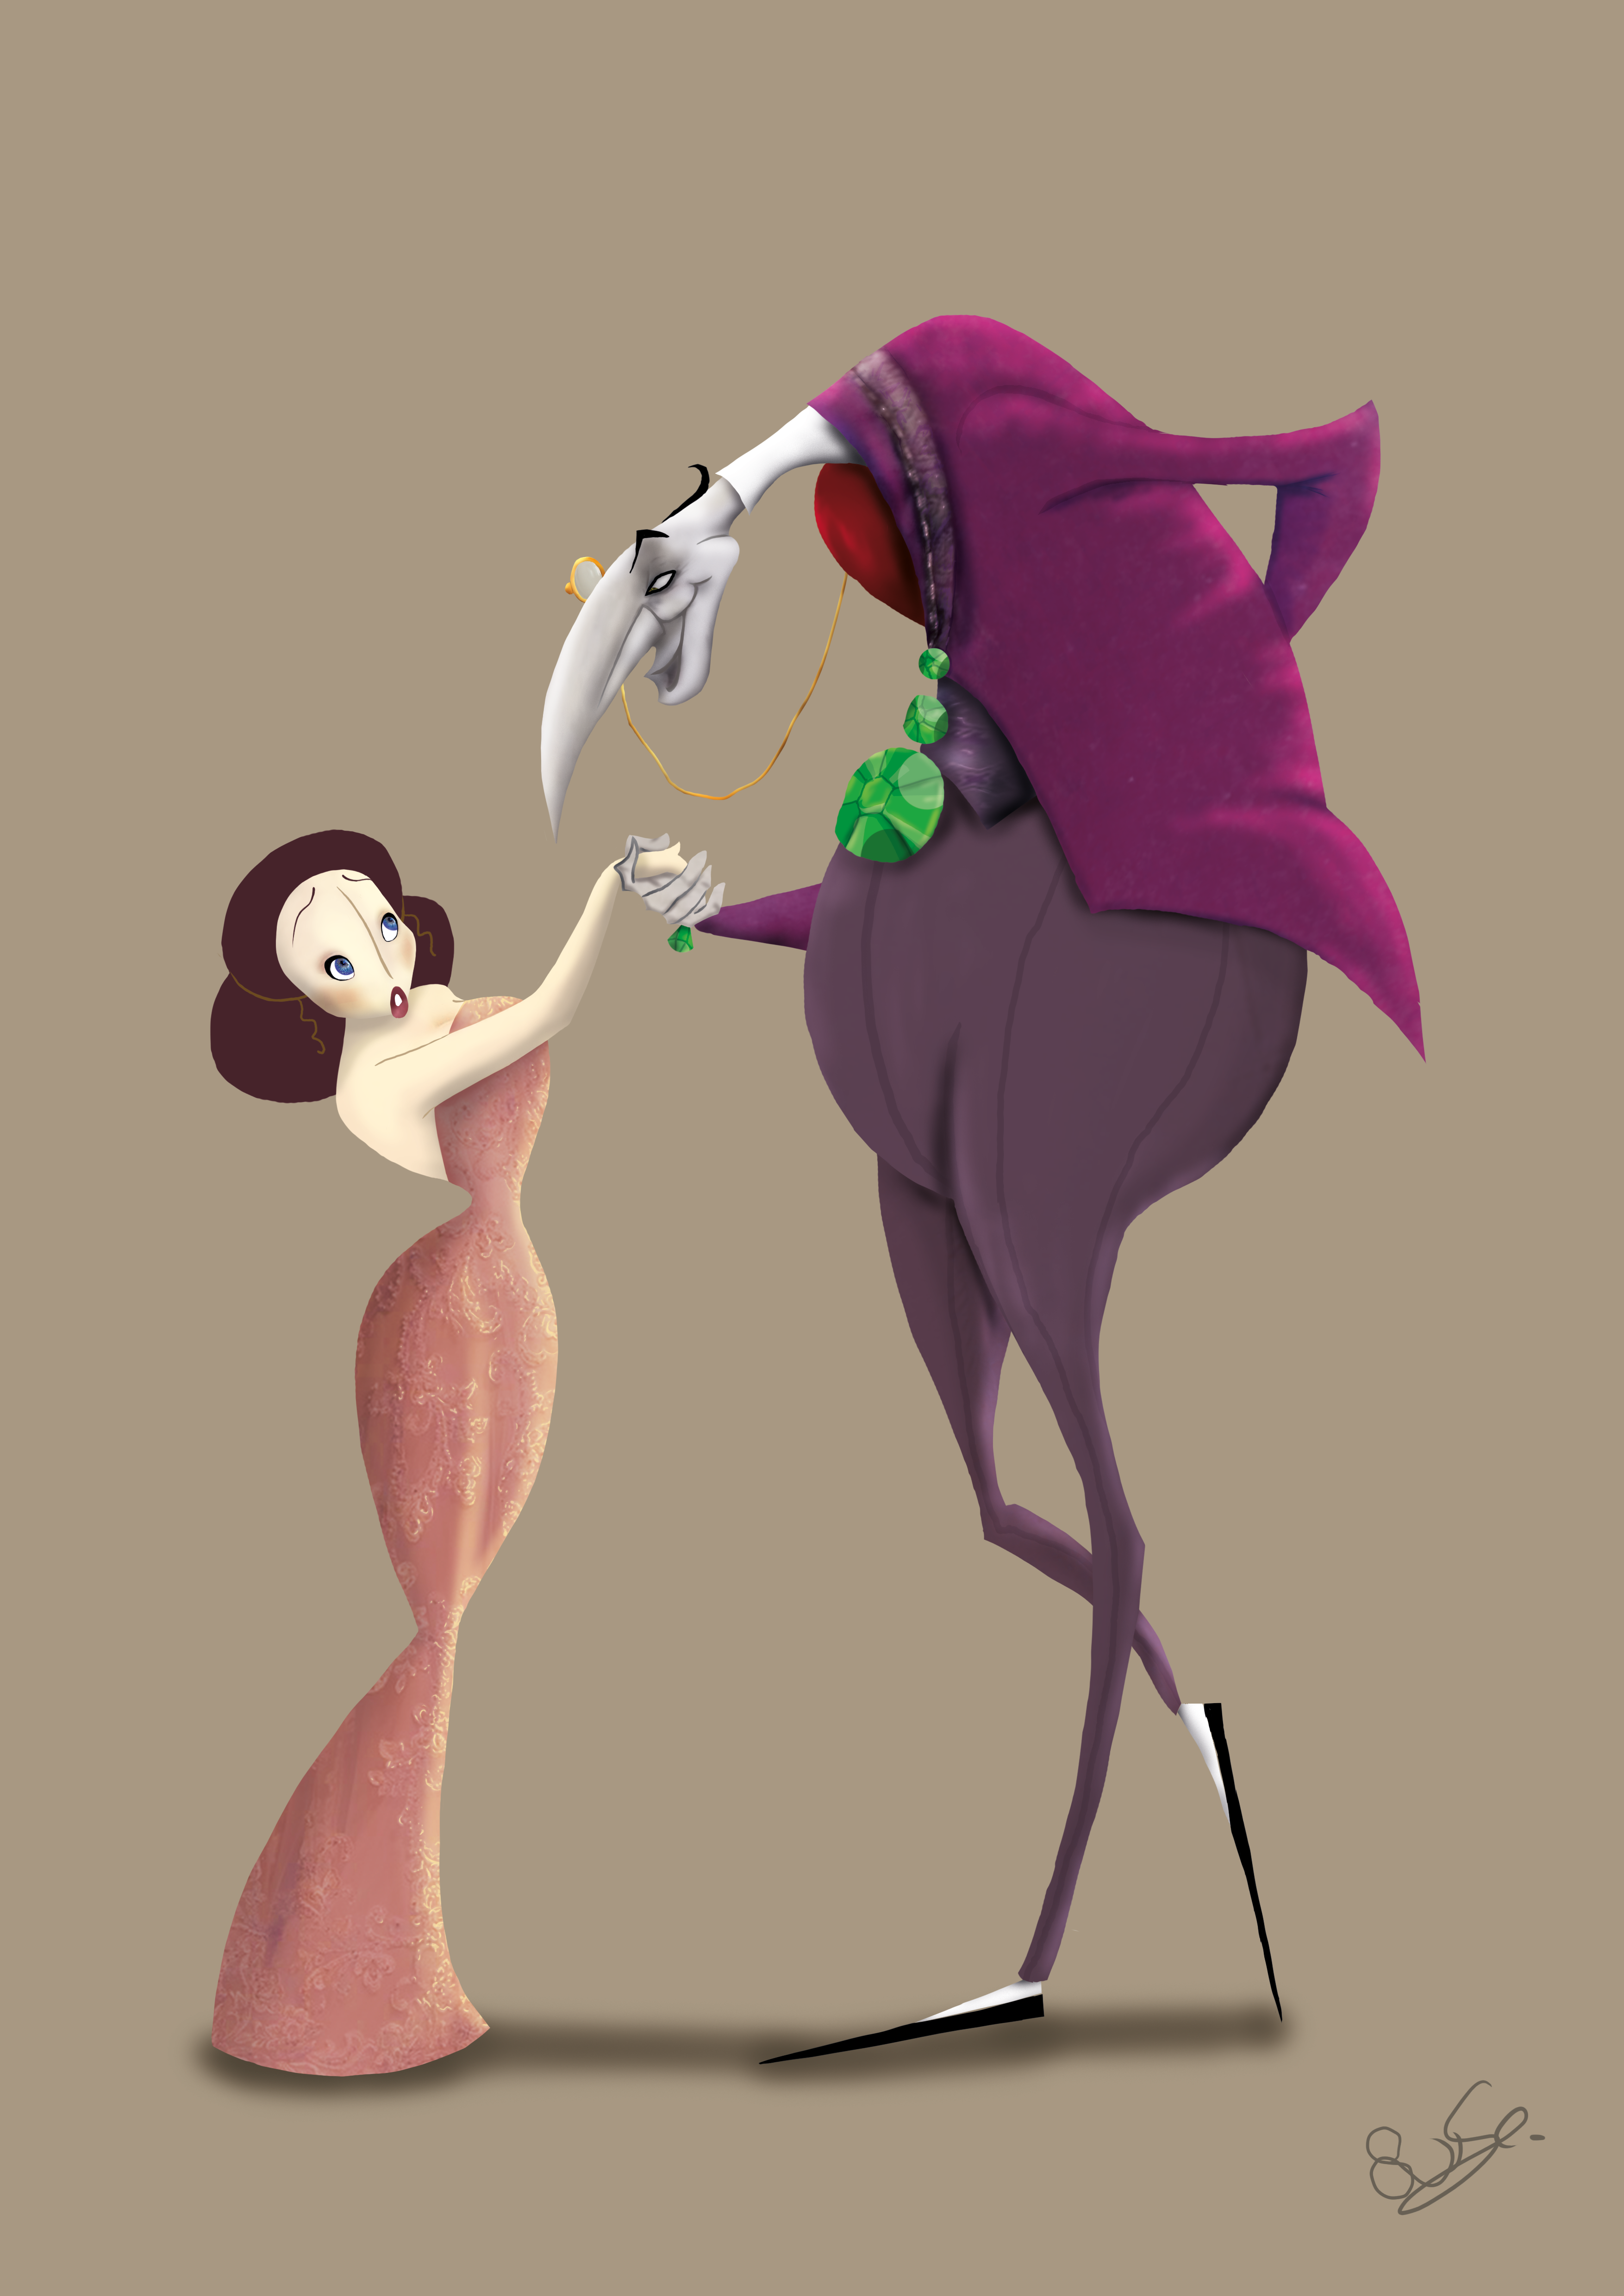 karakter design, man, vrouw, photoshop